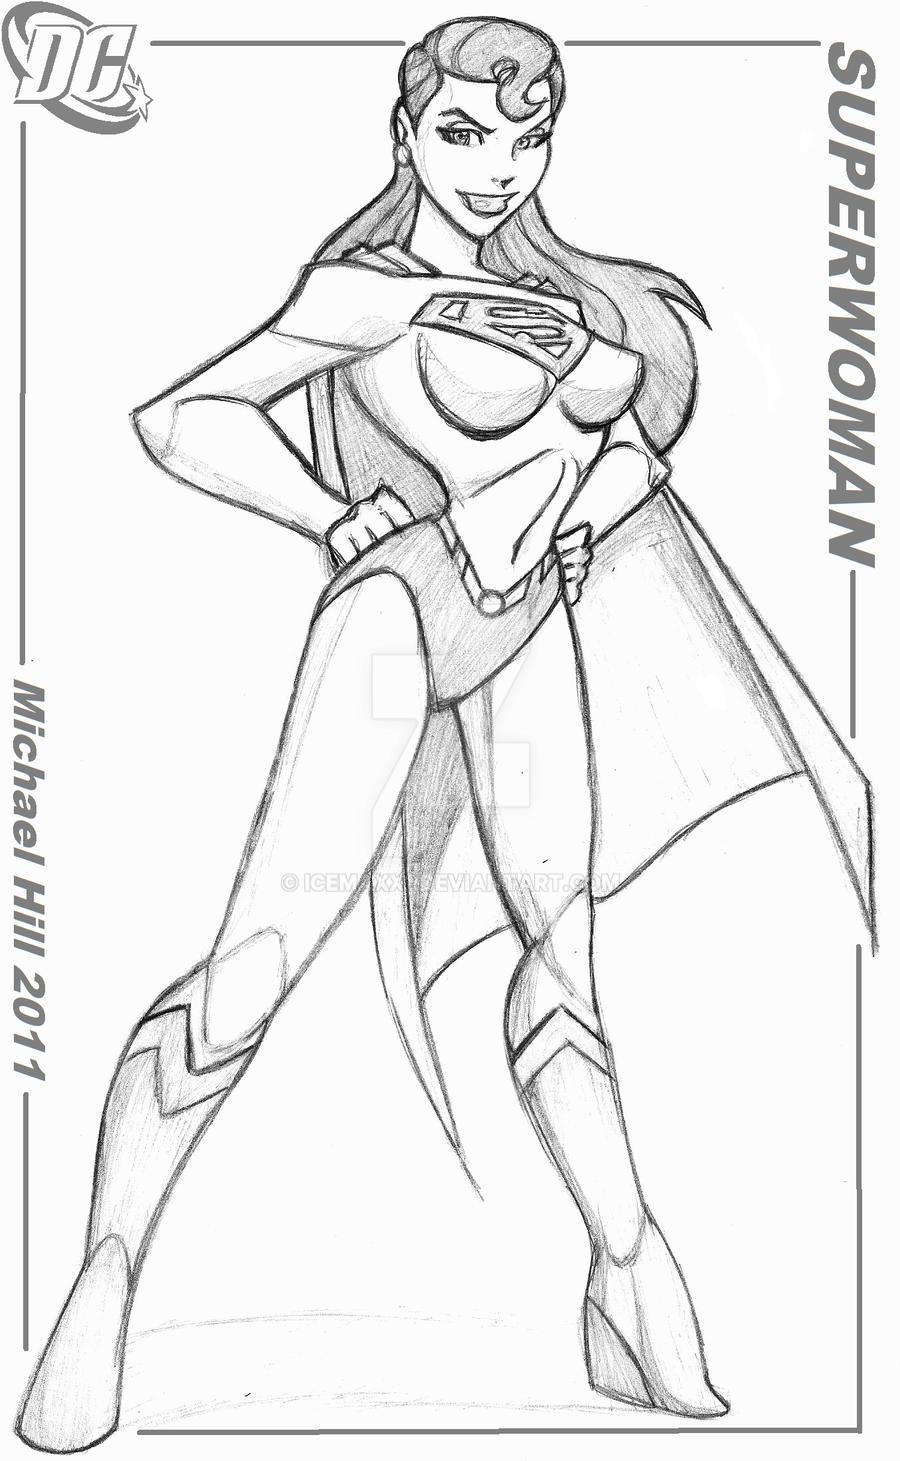 SUPERWOMAN by icemaxx1